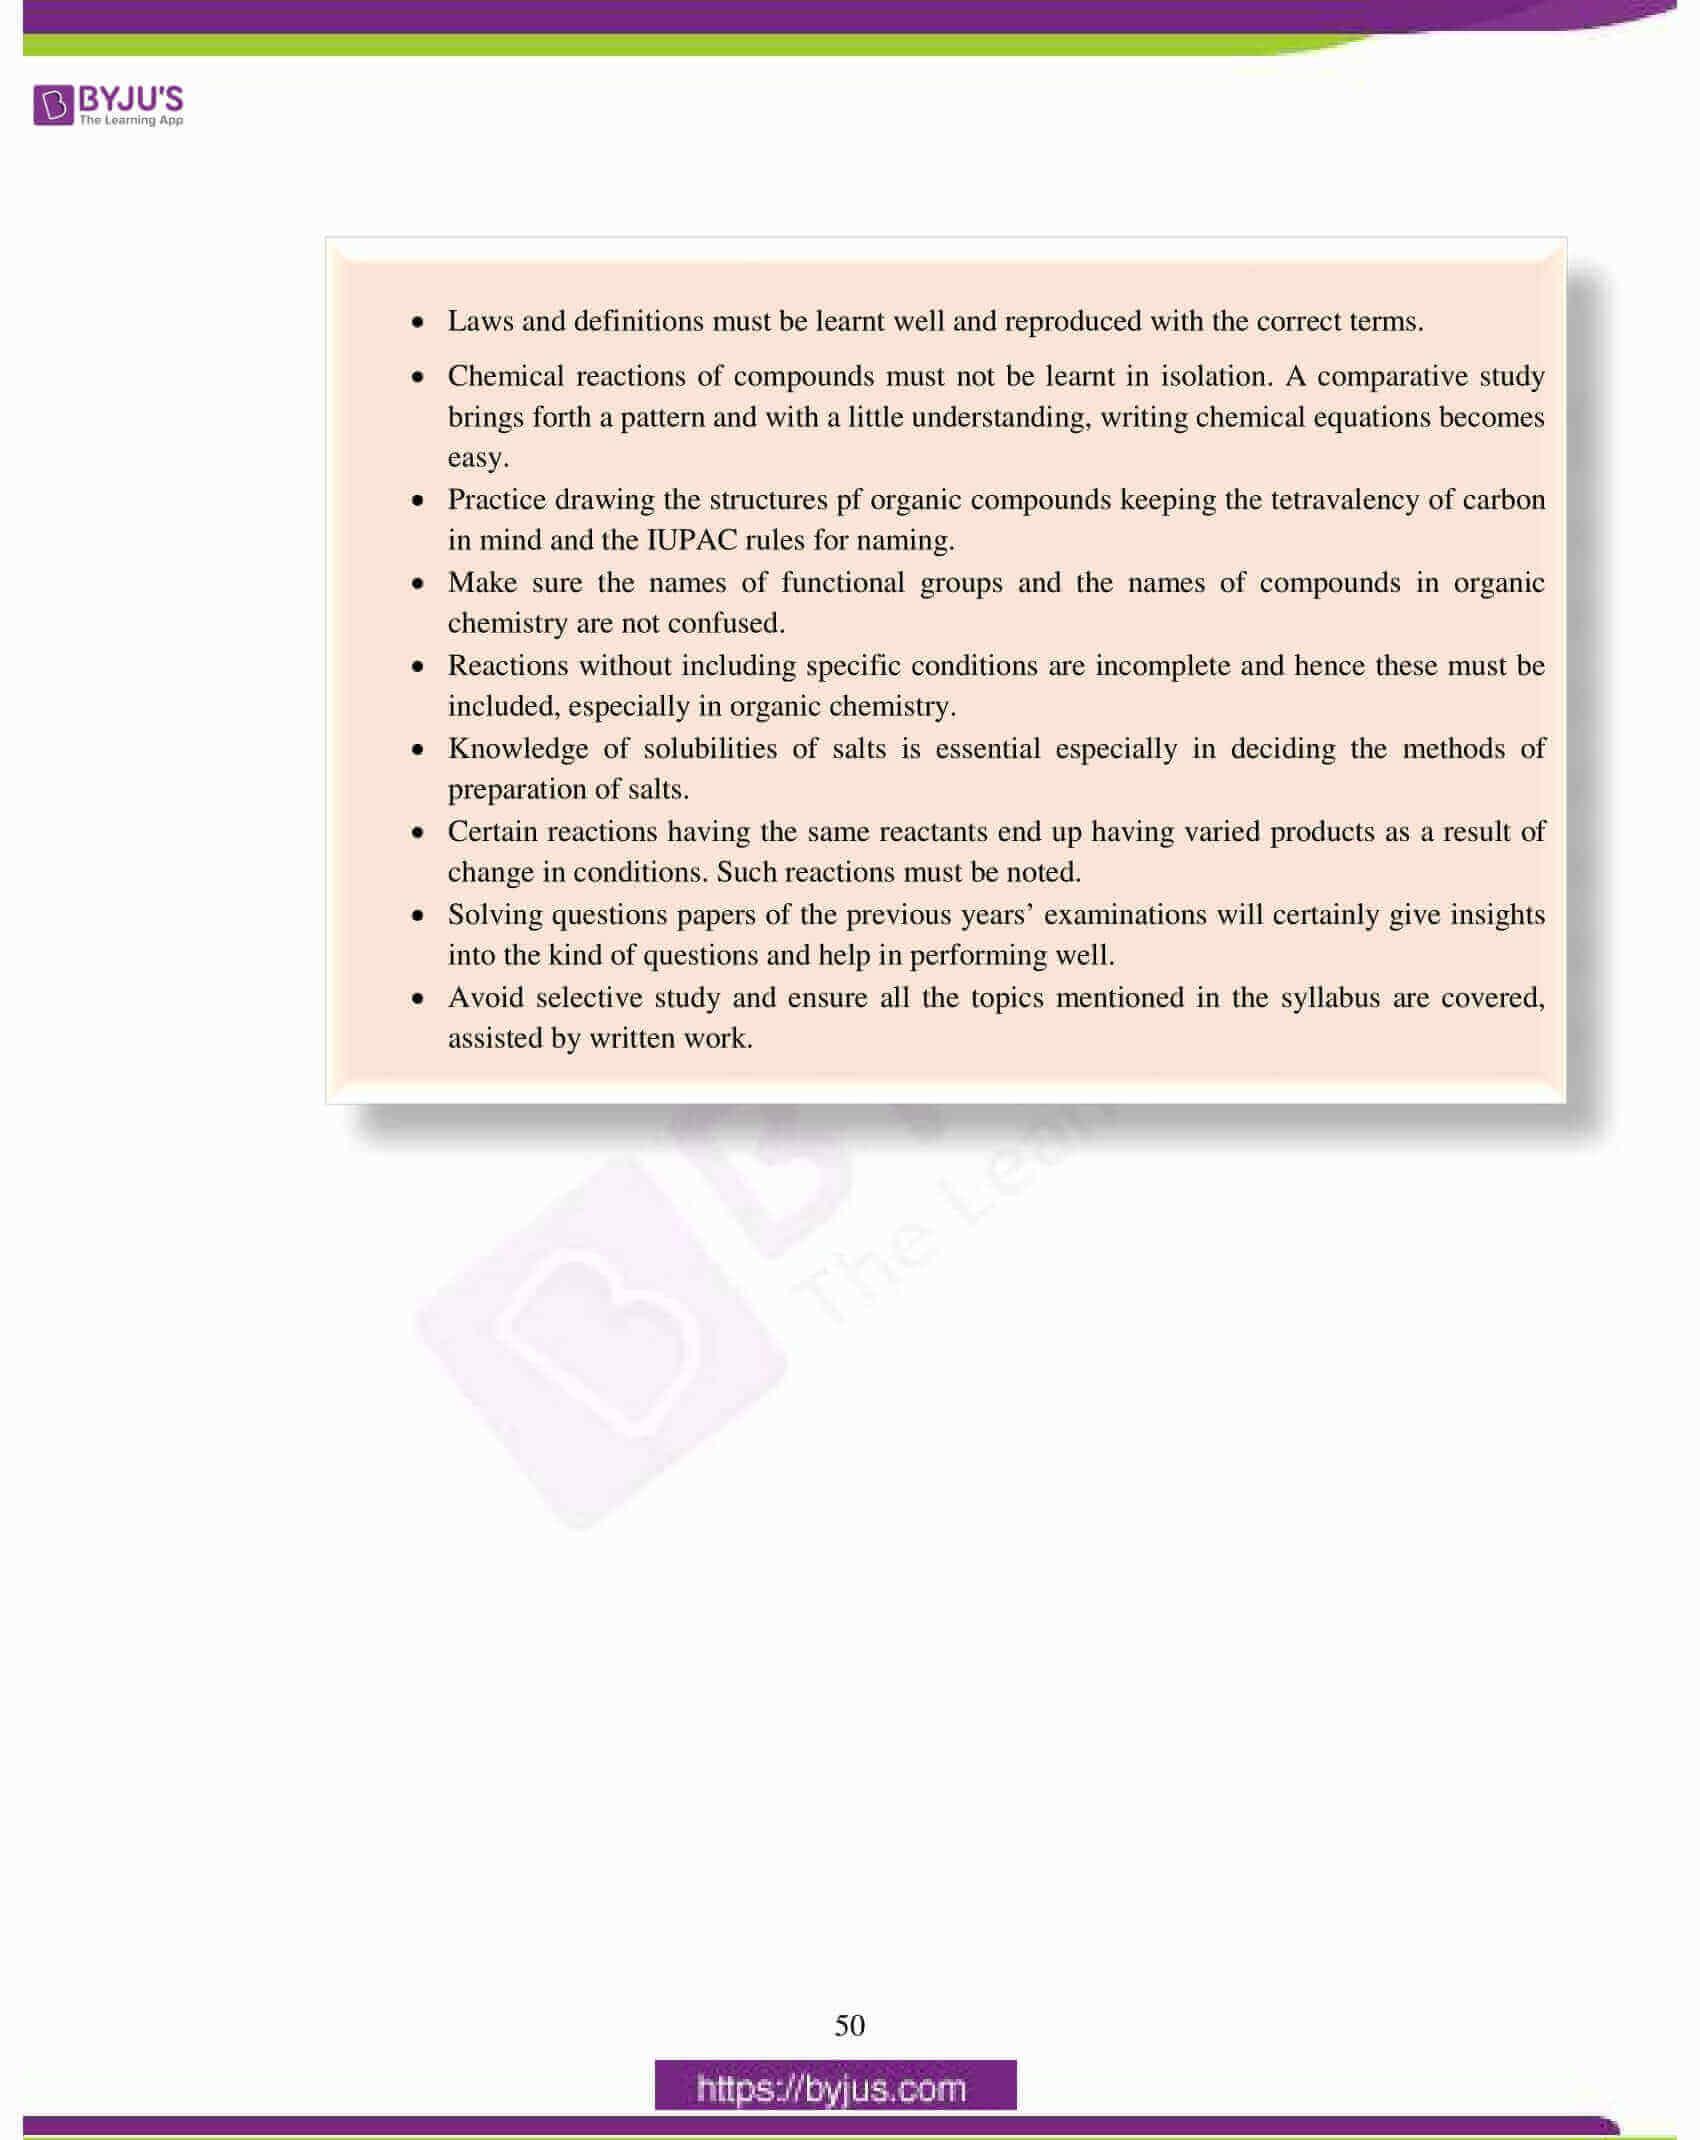 icse class 10 chemistry question paper solution 2017 22